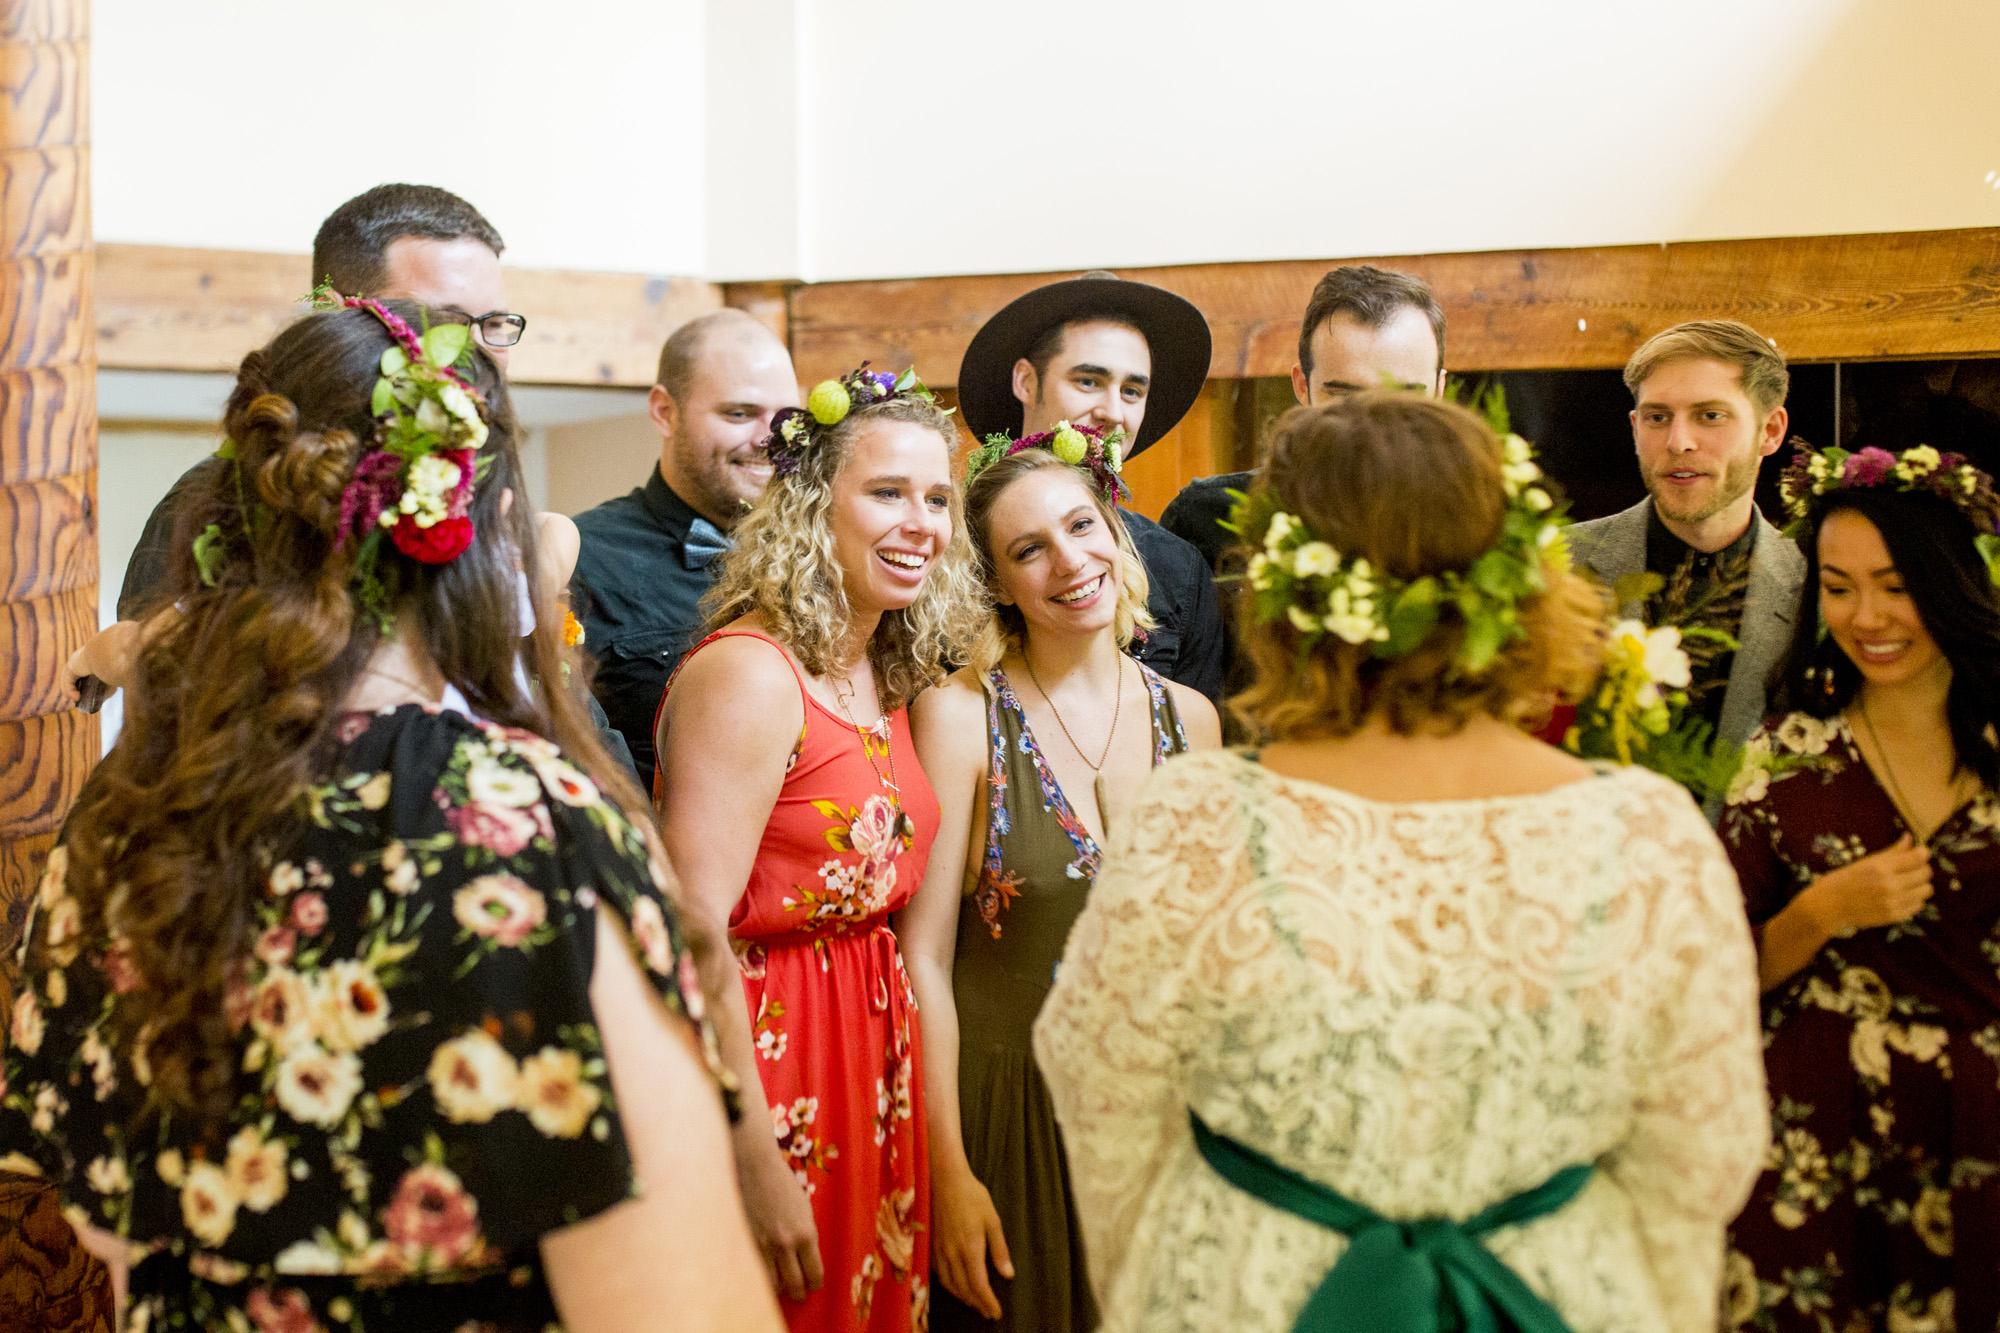 Seriously_Sabrina_Photography_Red_River_Gorge_Kentucky_Wedding_ShawnDana81.jpg